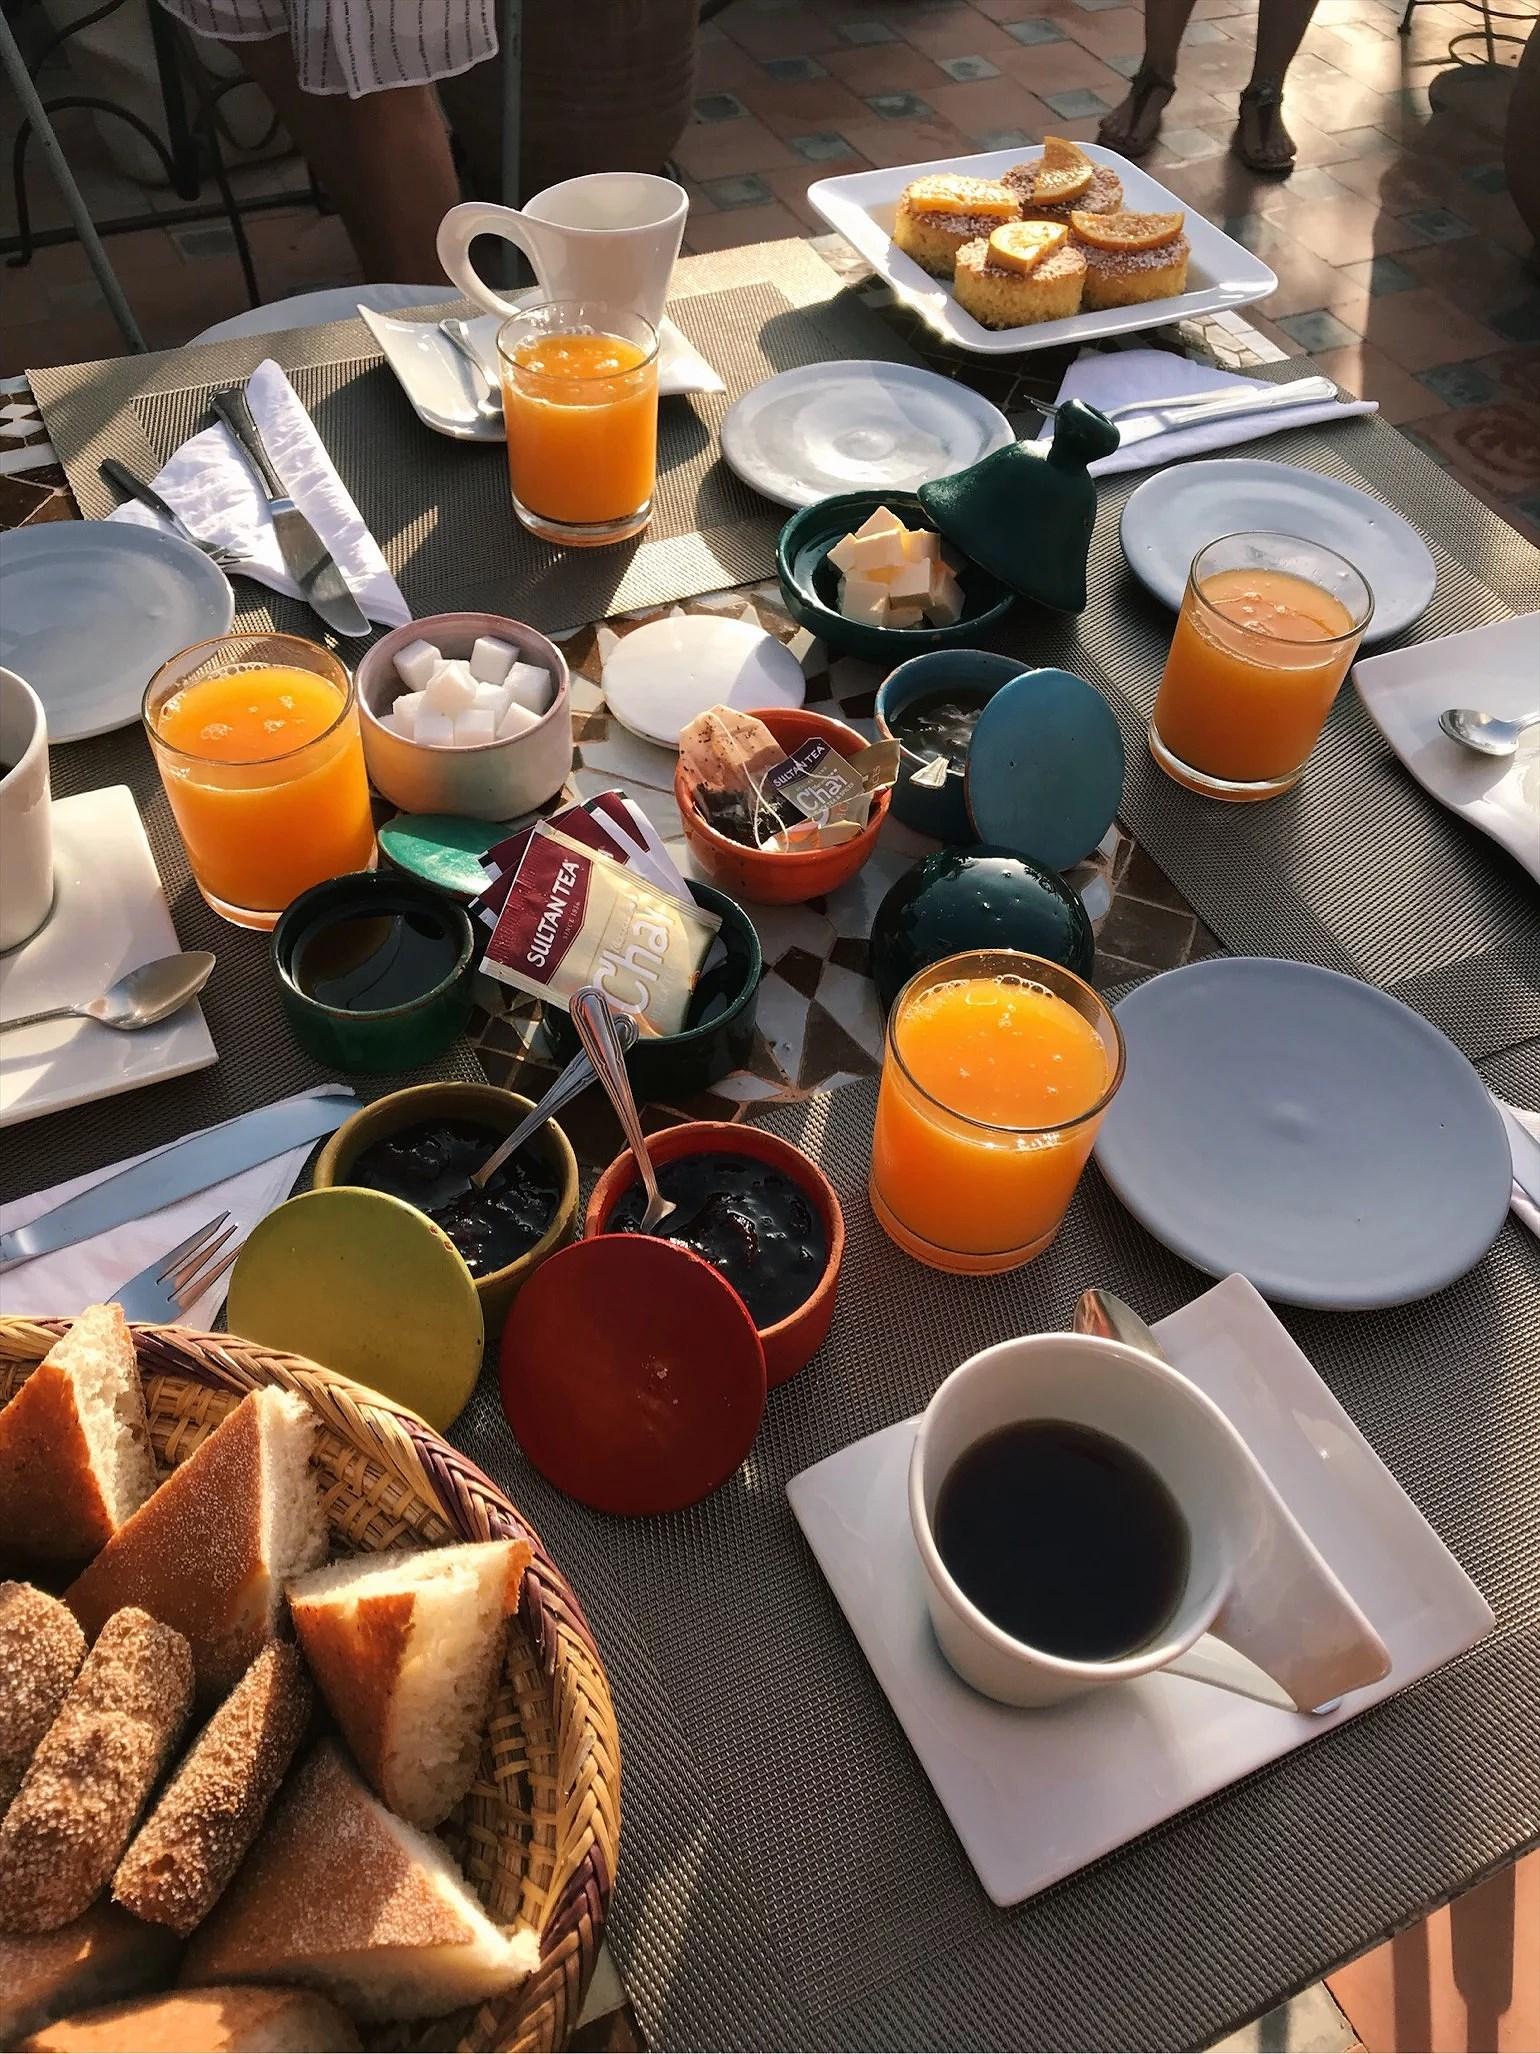 Livets frukost